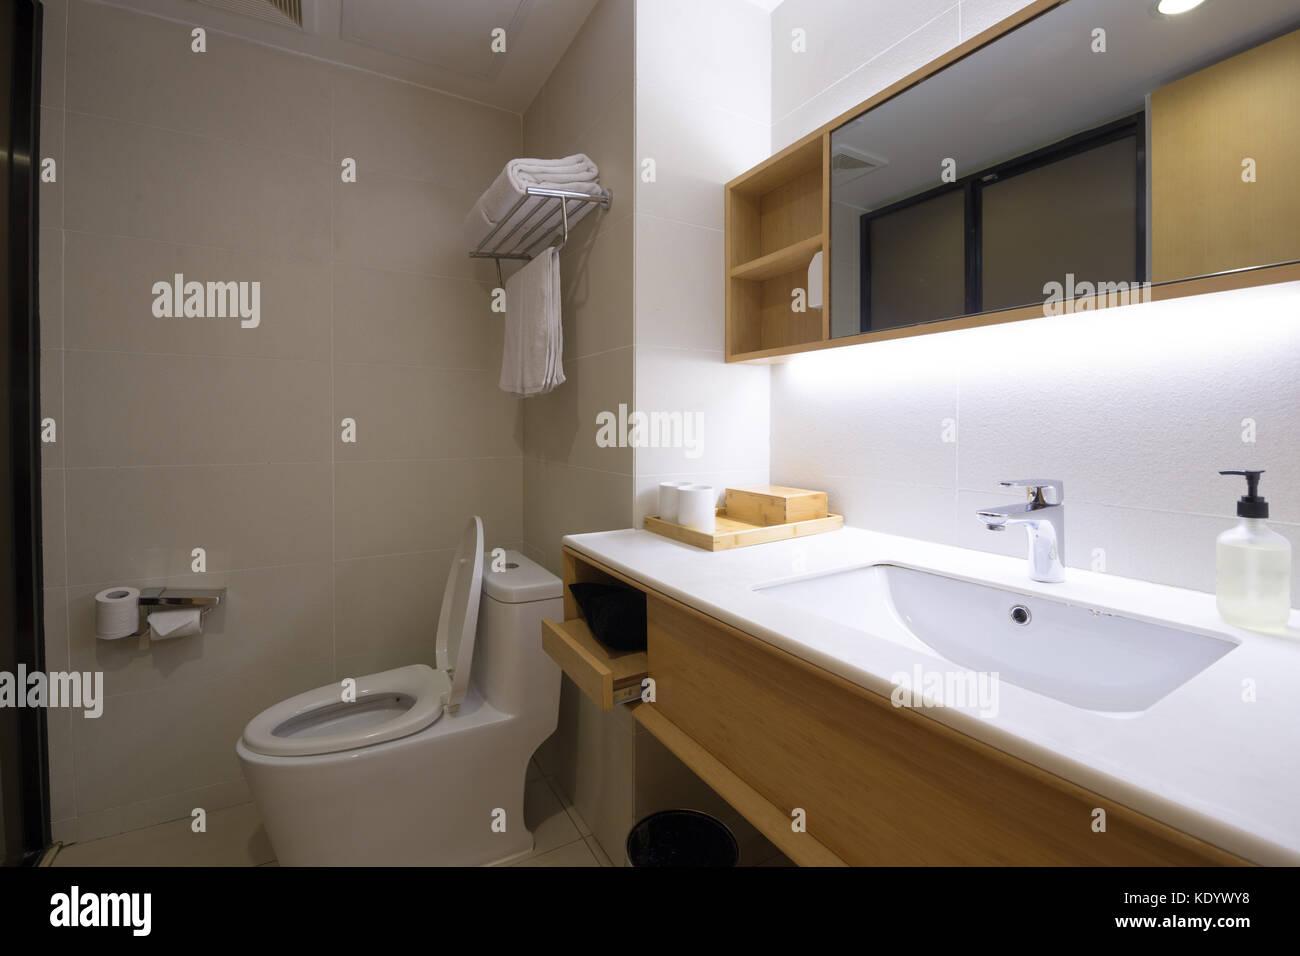 Commercial Bathroom Stock Photo Alamy